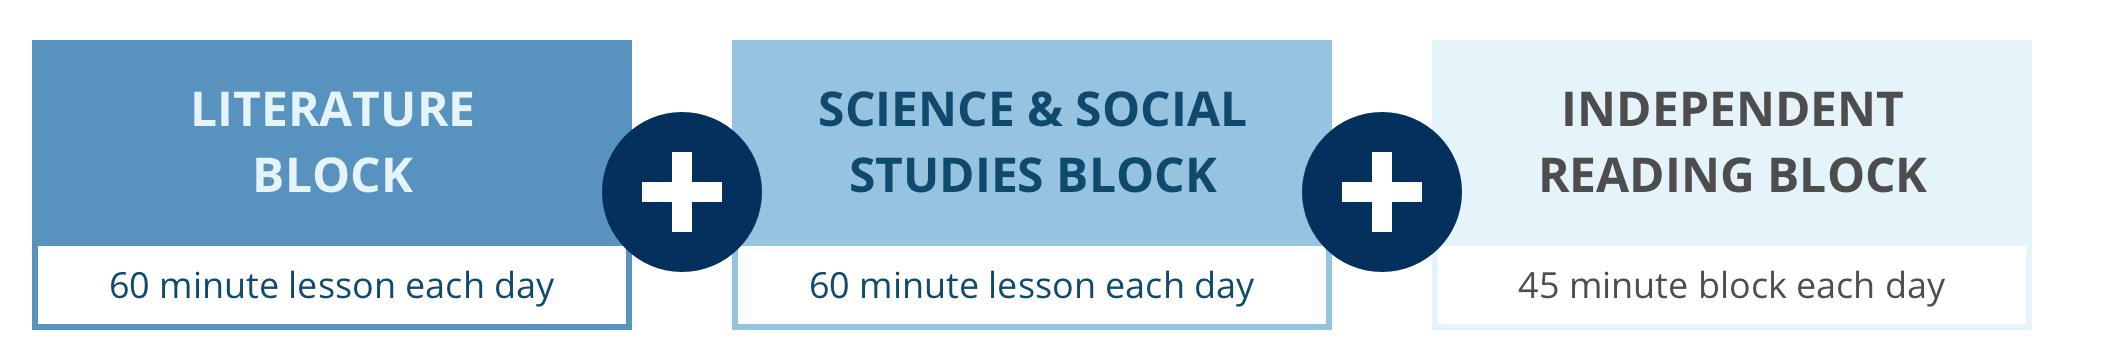 ELA Components: Literature + Science & Social Studies + Independent Reading